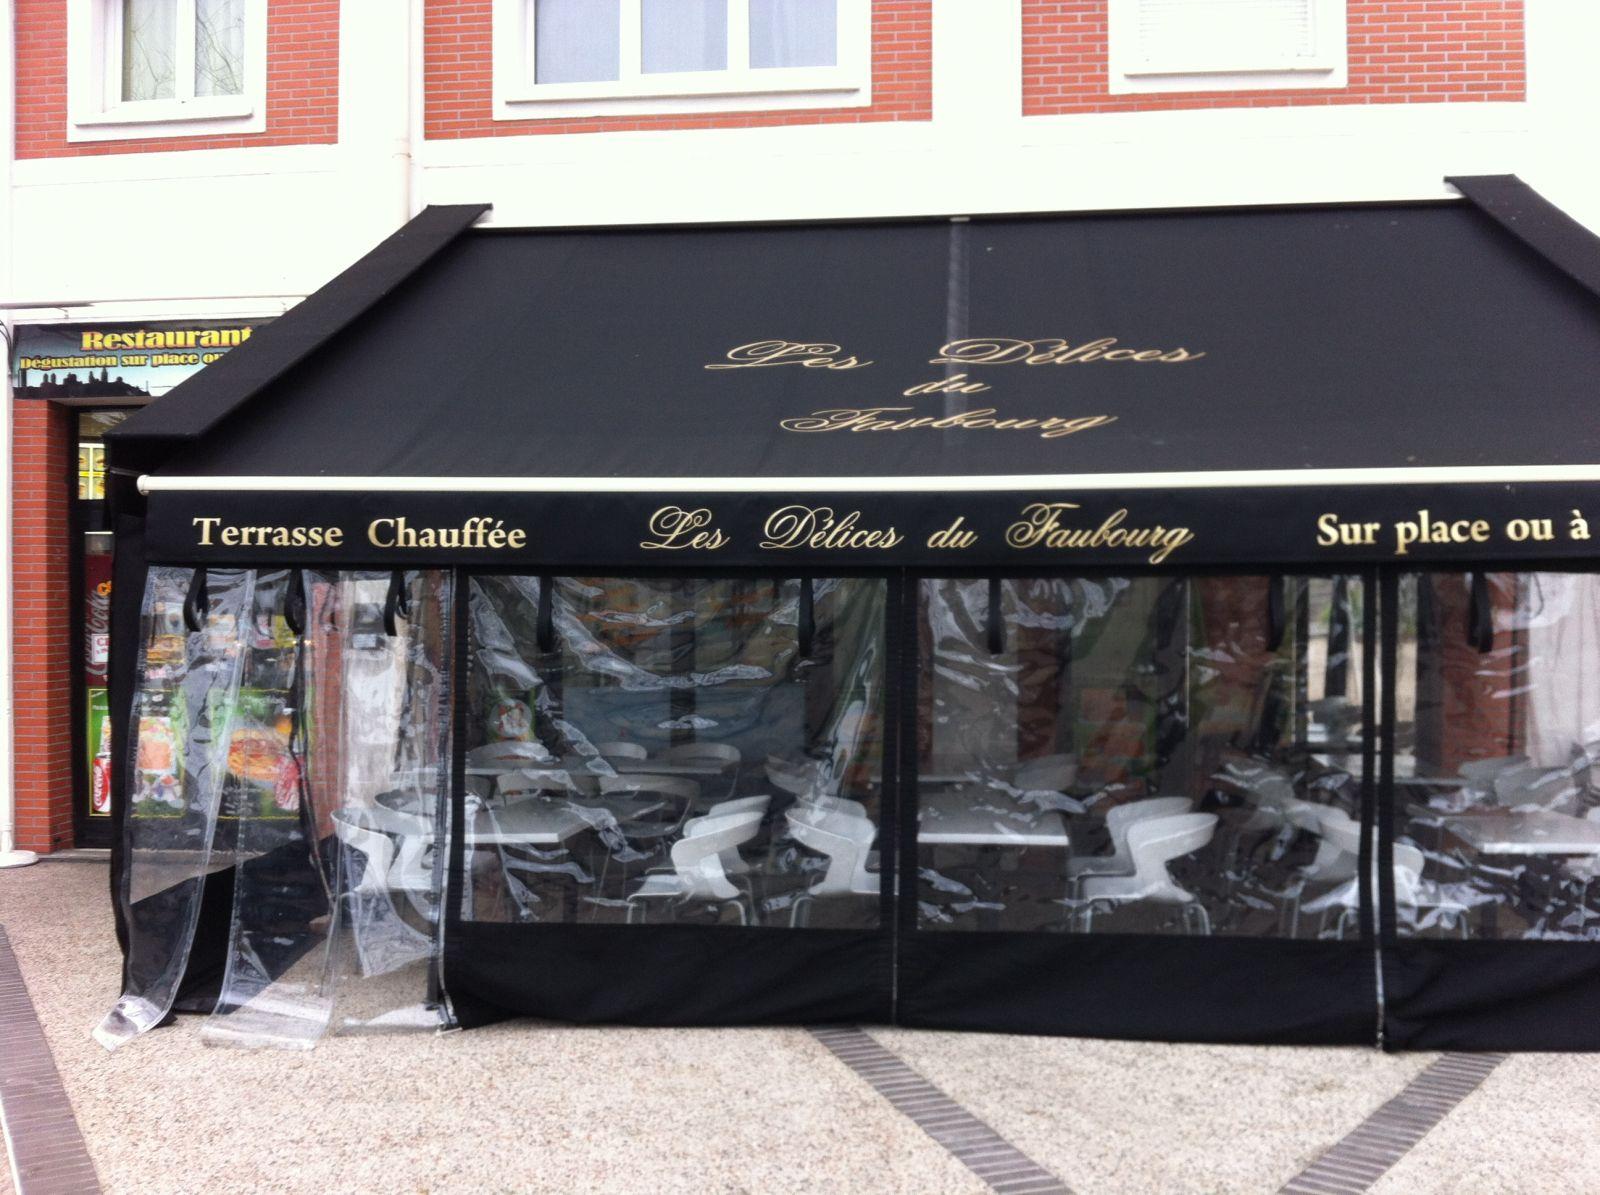 Store Banne Pour Terrasse Cafe Cartier Love Online